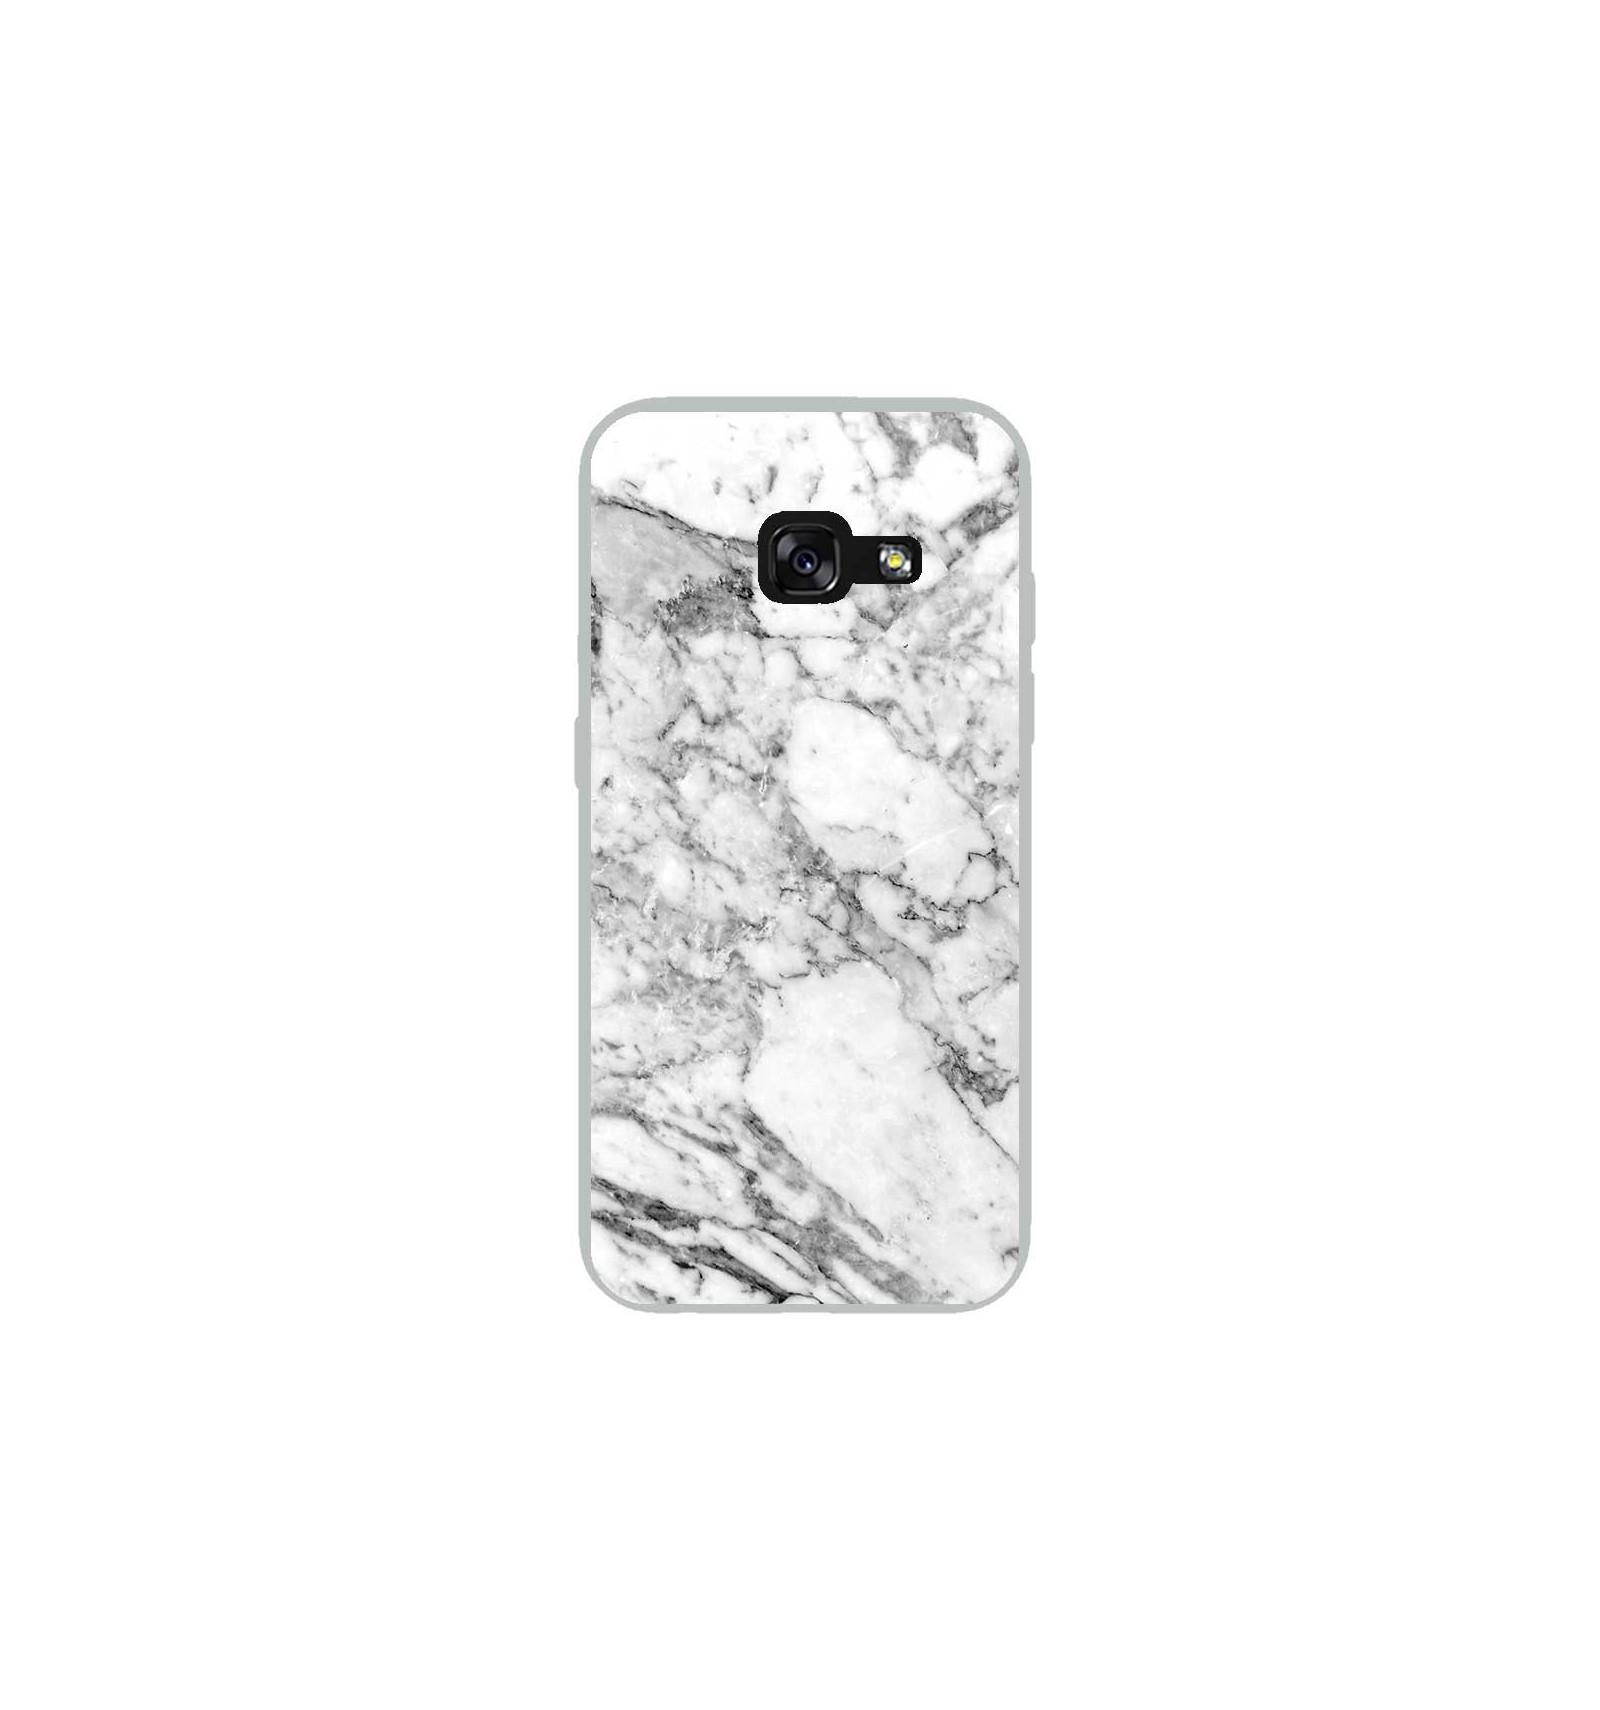 coque huawei p8 lite 2017 marbre